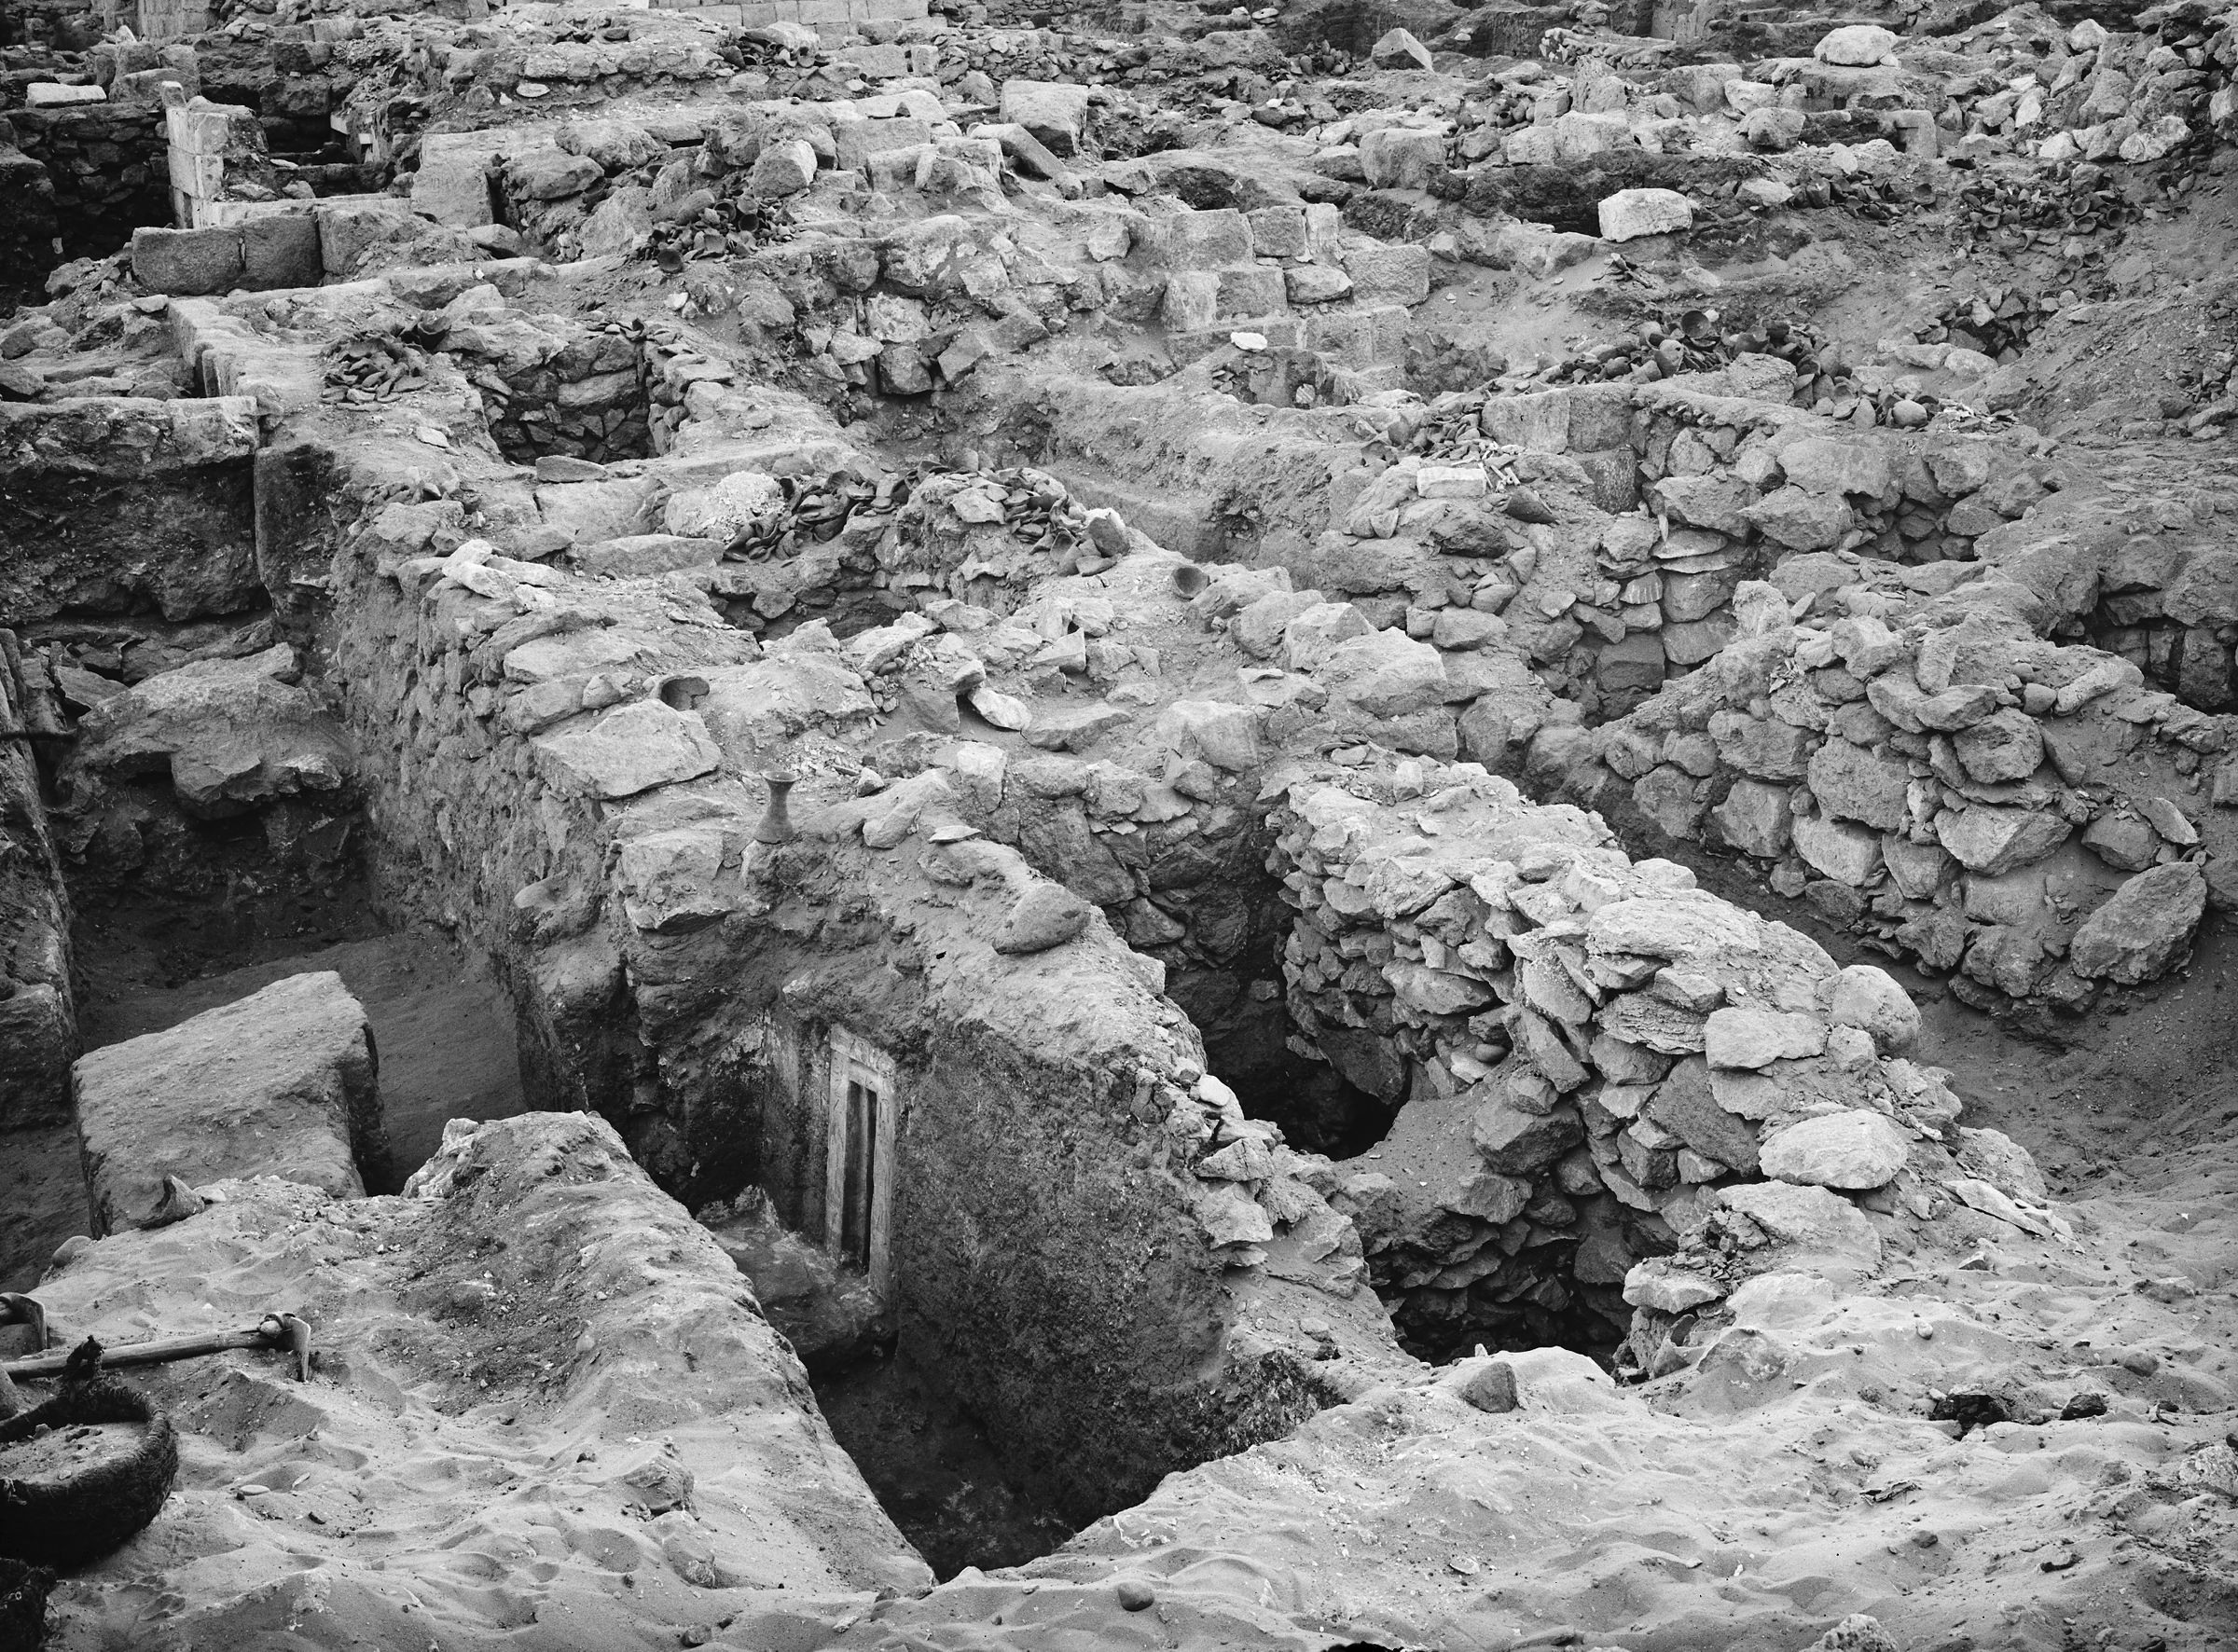 Western Cemetery: Site: Giza; View: G 1123, G 1122, G 1121, G 1124, G 1119